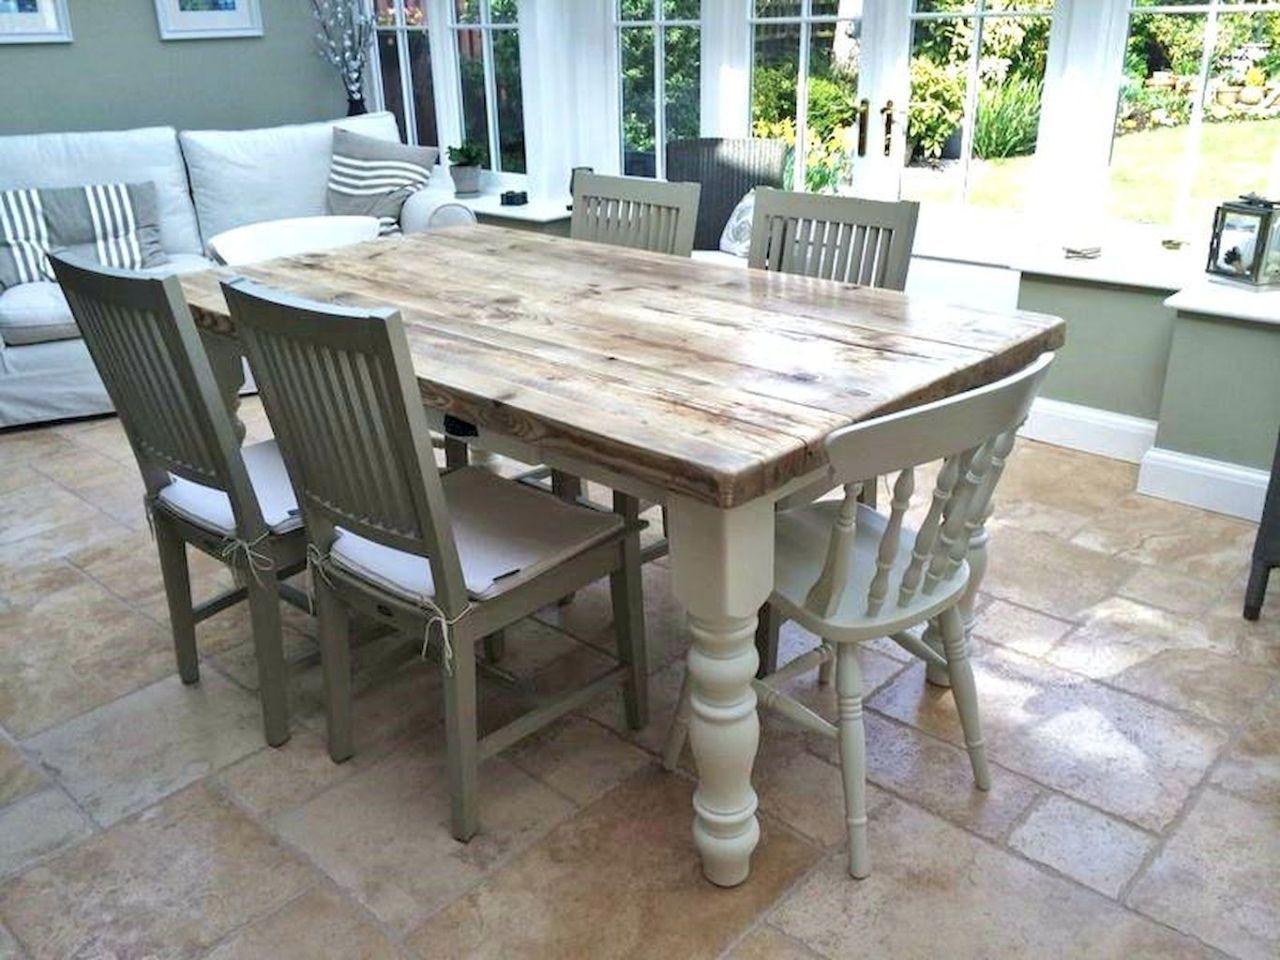 shabby chic kitchen table for sale house architecture design rh zj znwvj sg scikg obzhs tititoys store